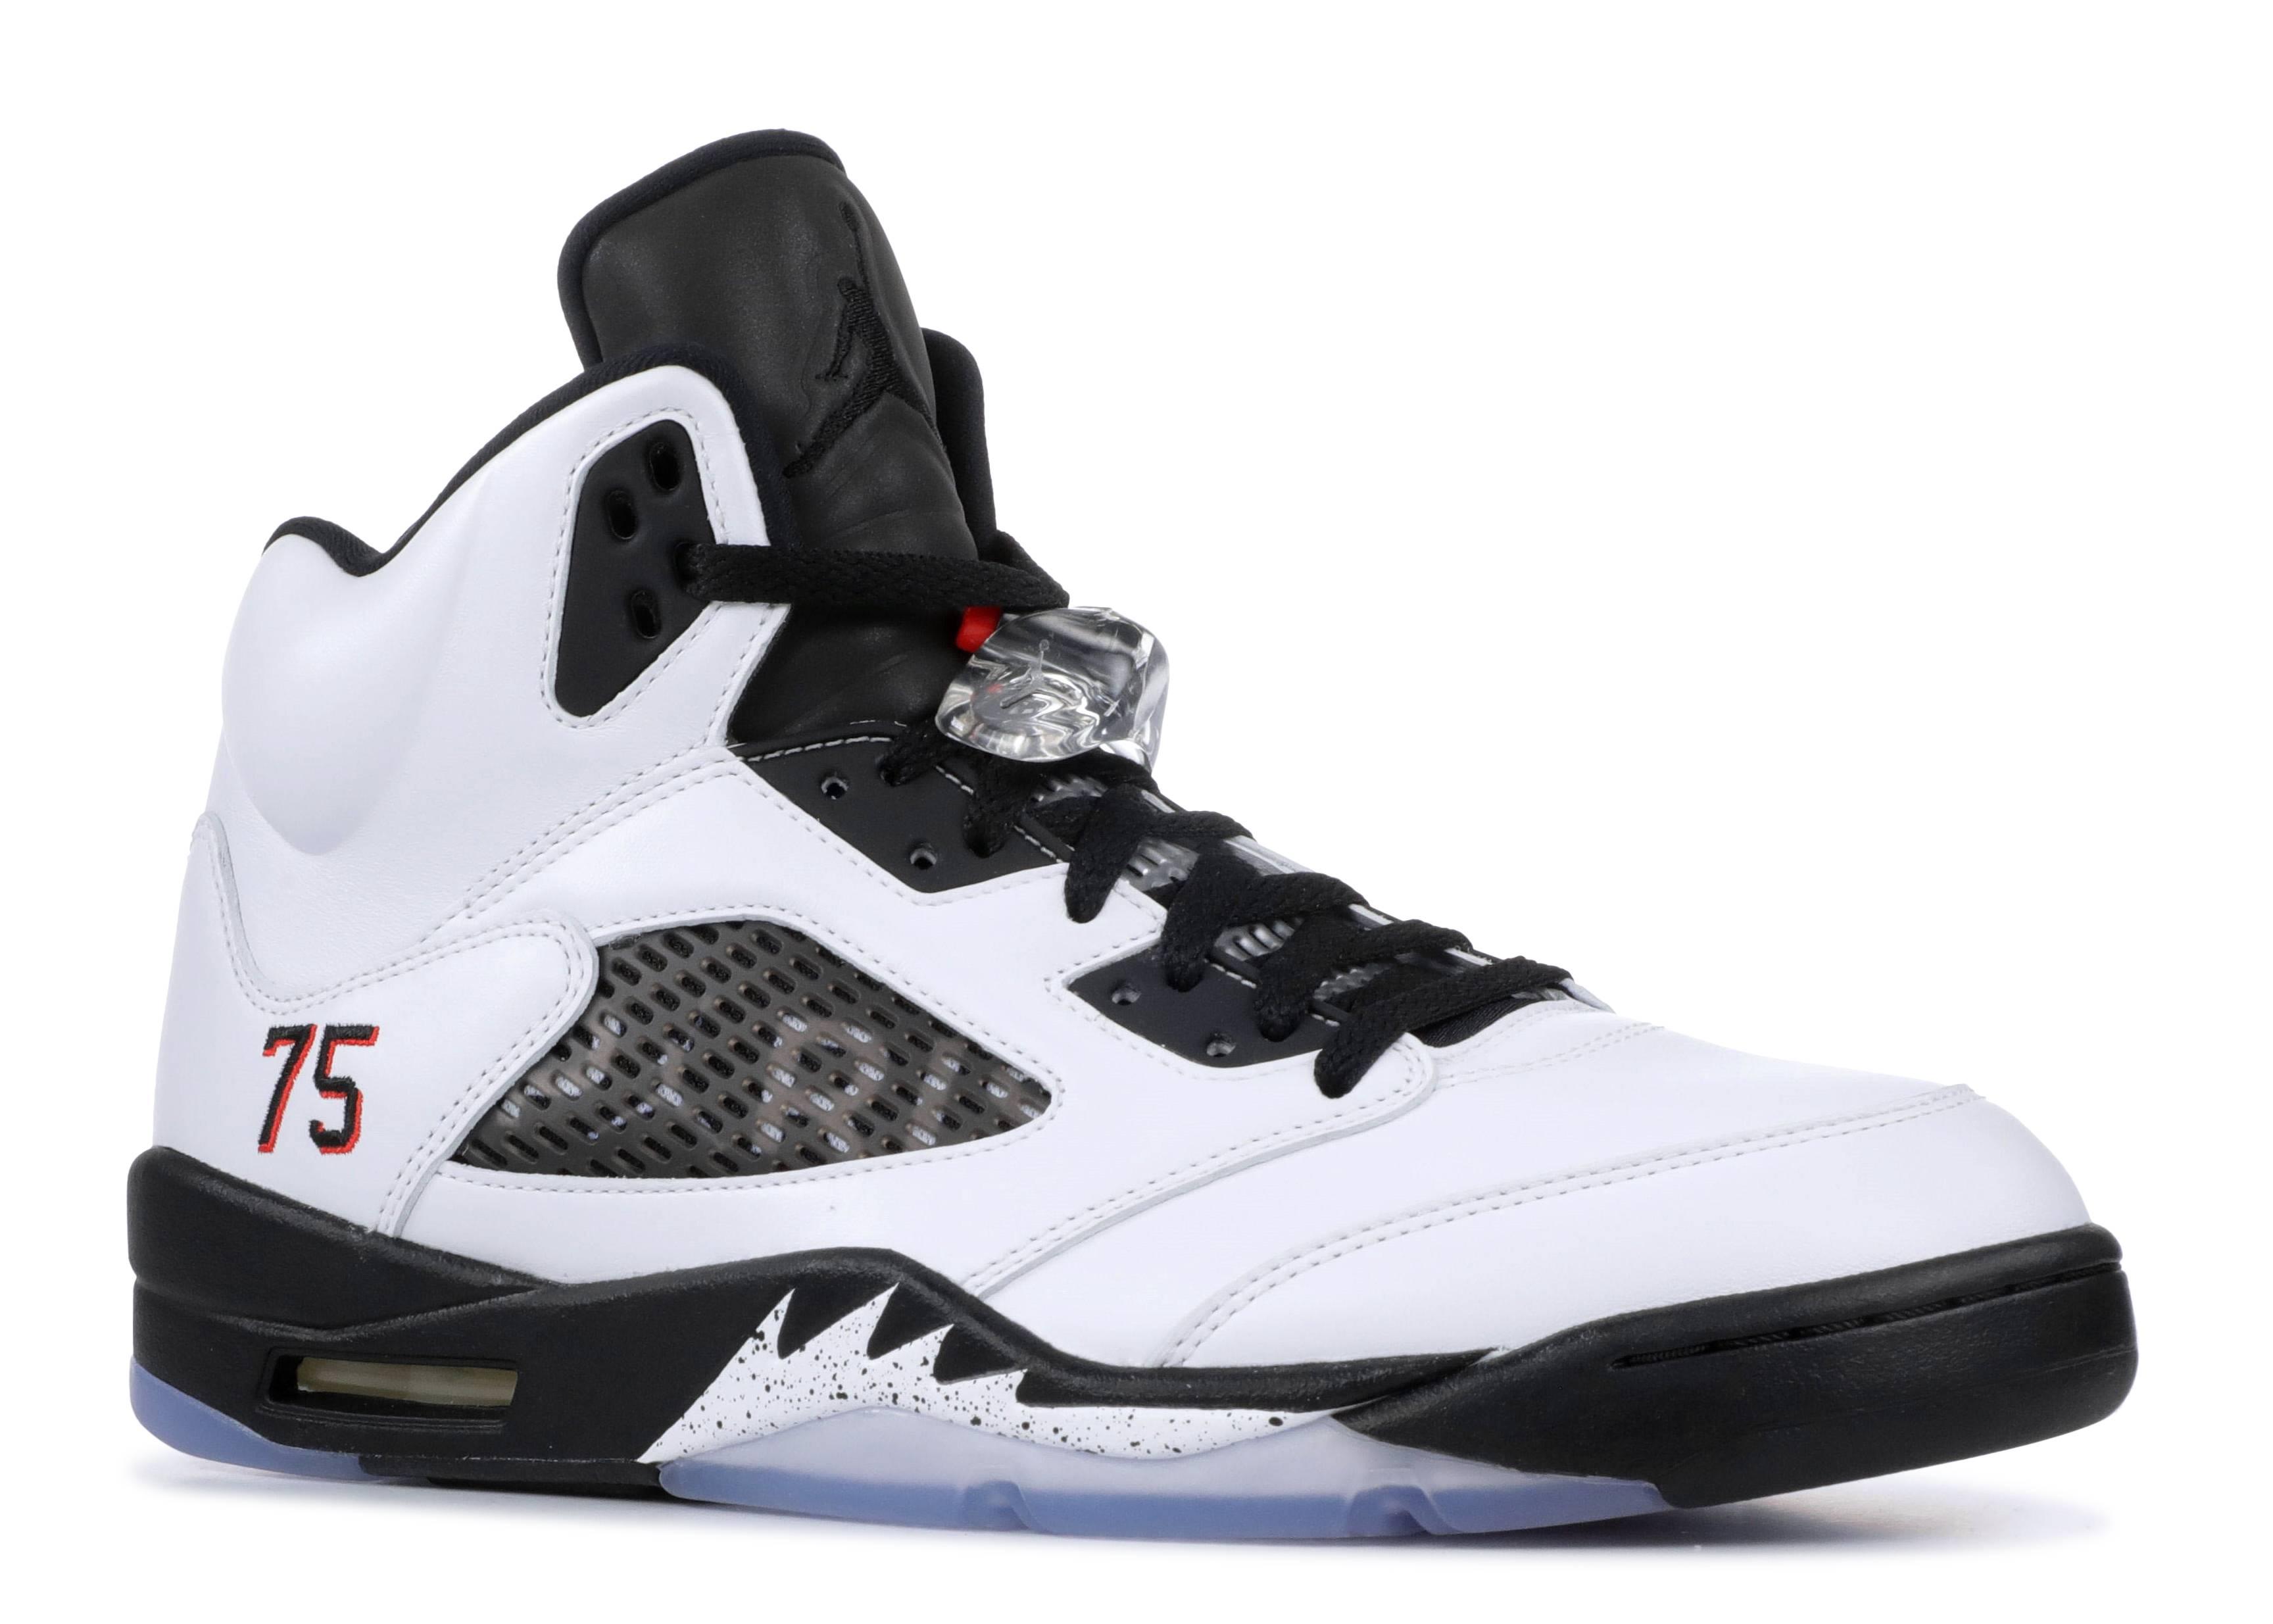 db112f4c1000ee Air Jordan 5 Retro